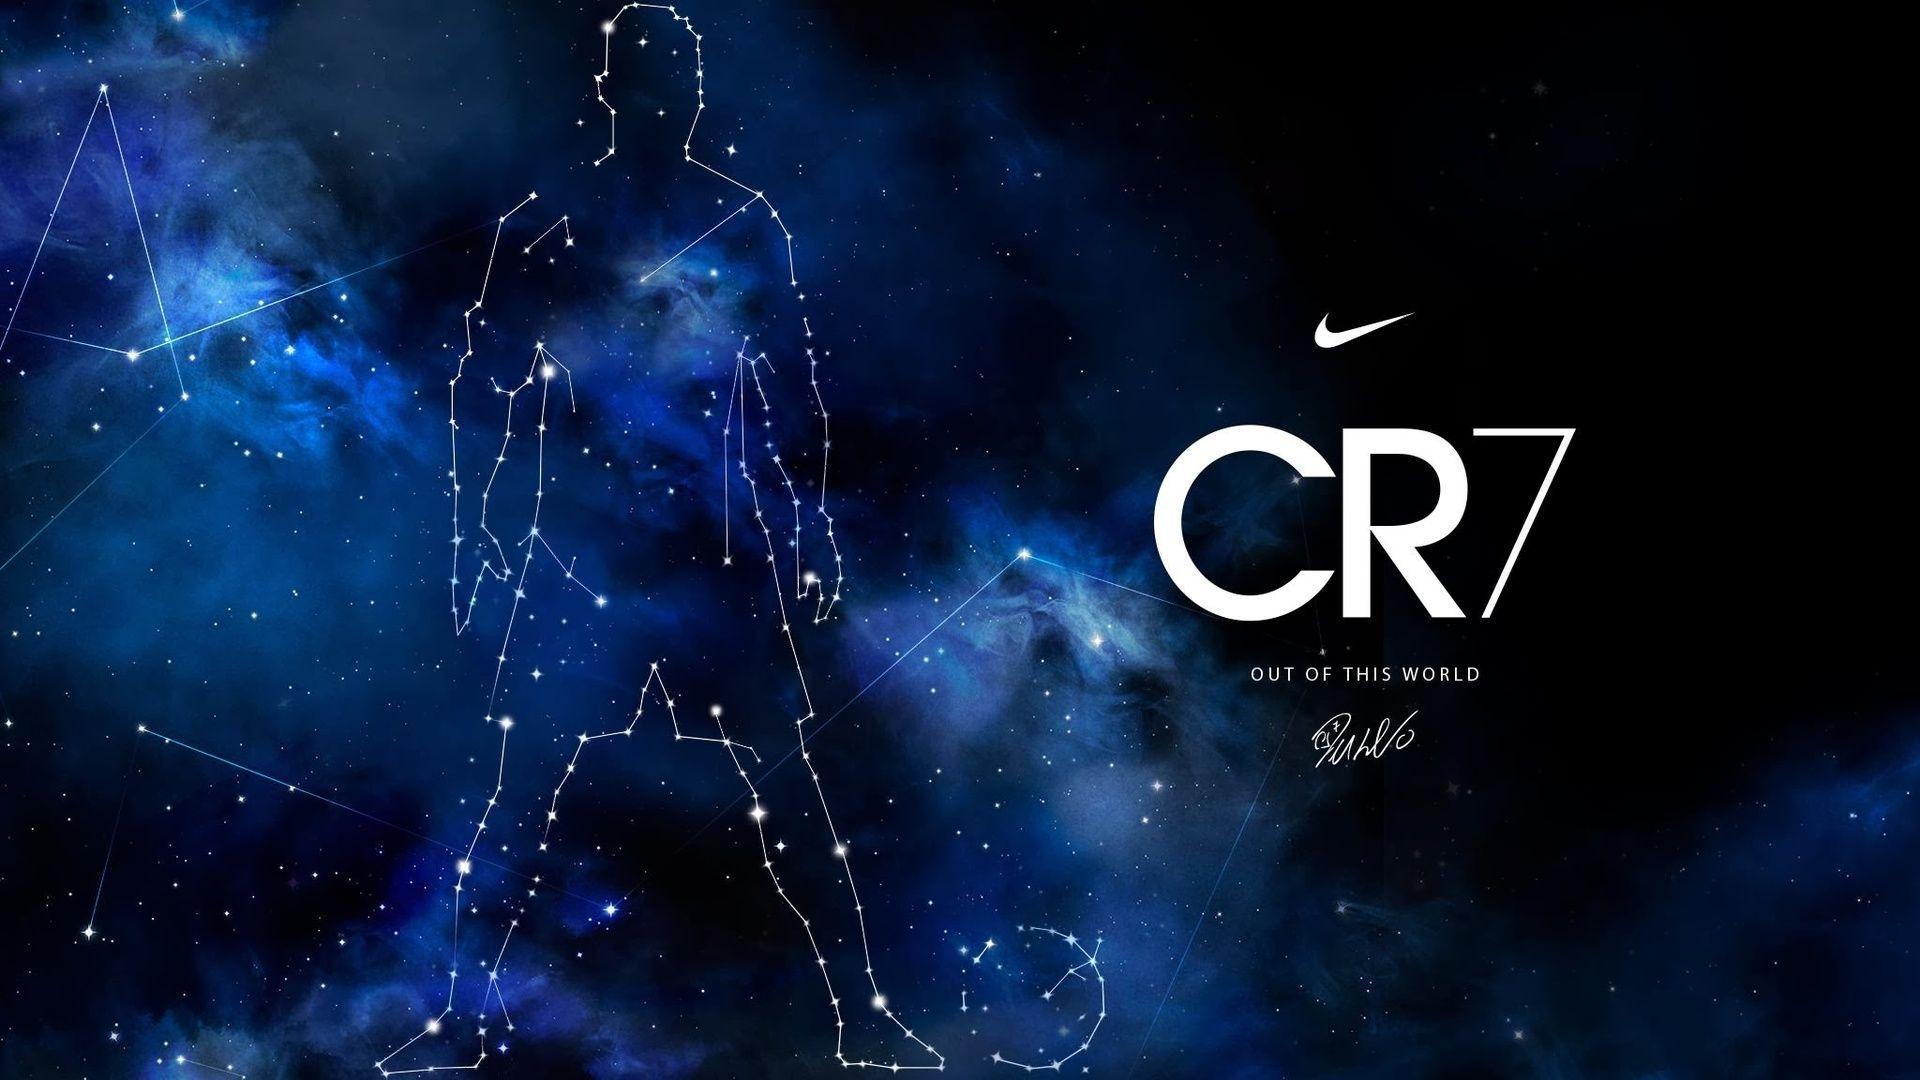 Cr7 logo wallpapers wallpaper cave - Hd photos of cr7 ...